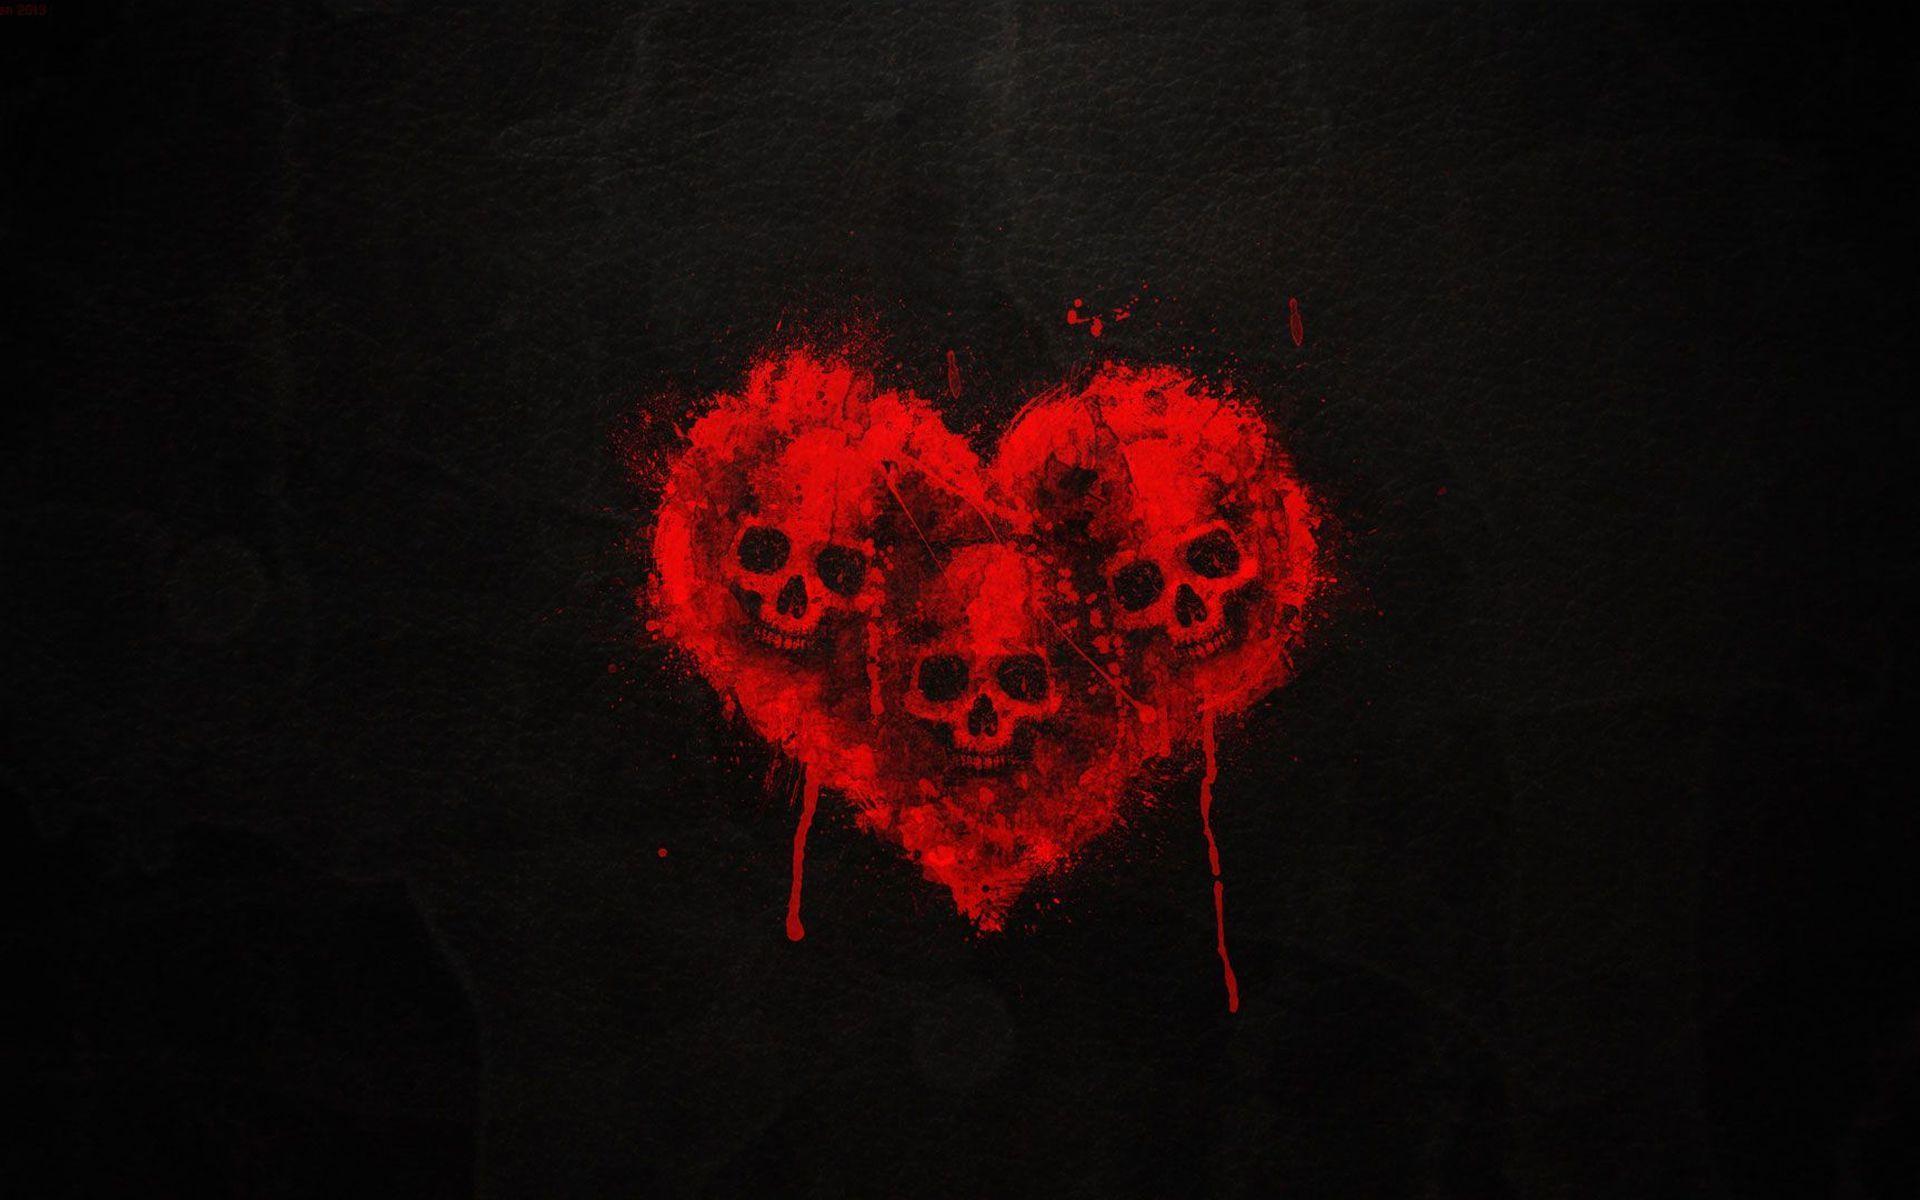 Black Heart Wallpapers - Wallpaper Cave